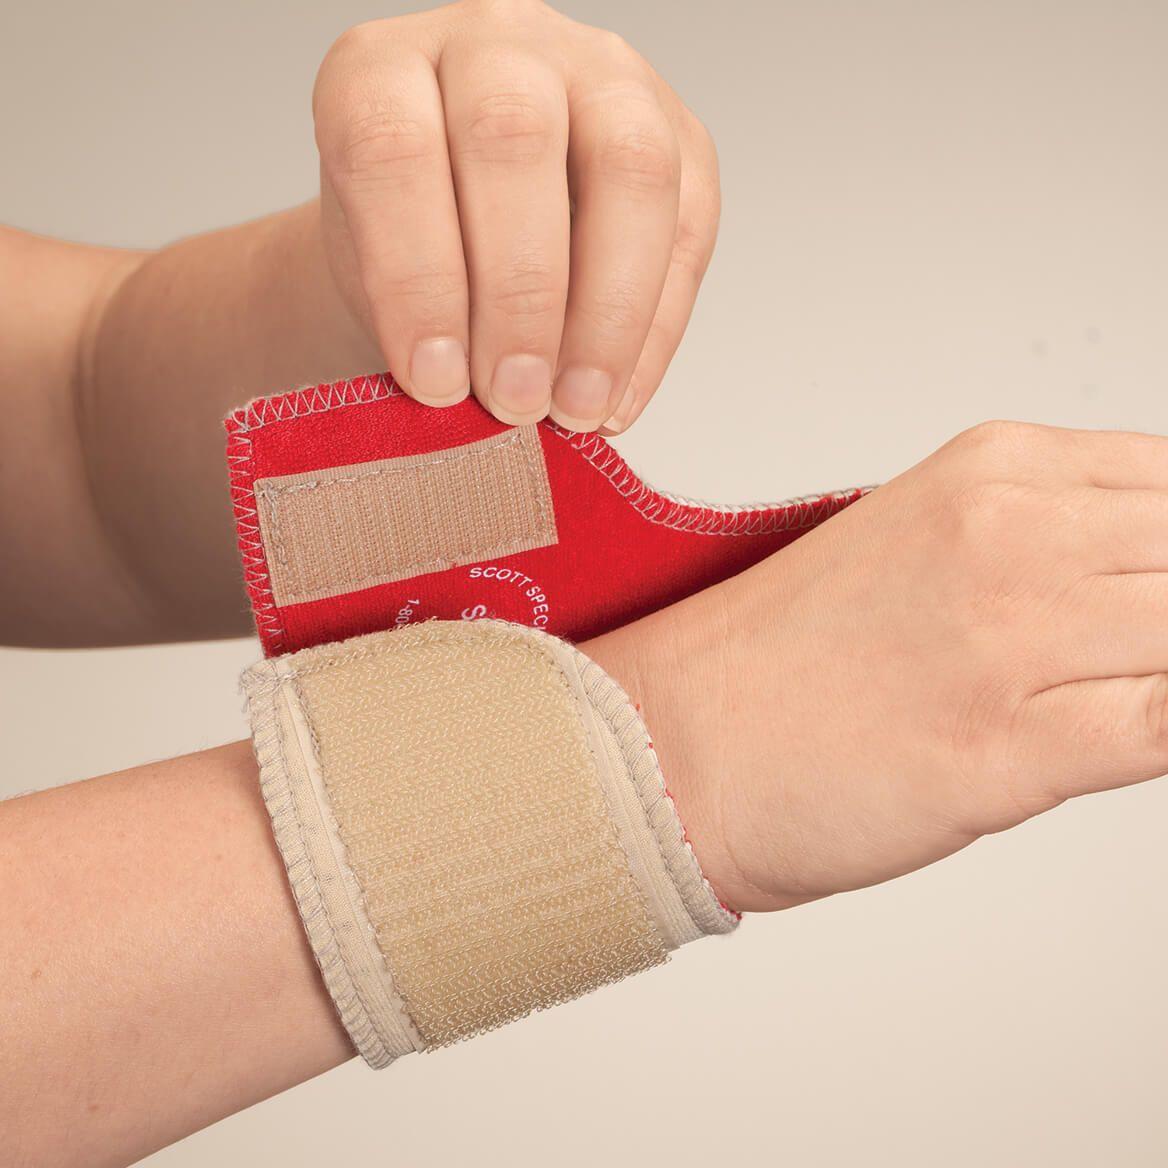 Arthritic Thumb Support-361275